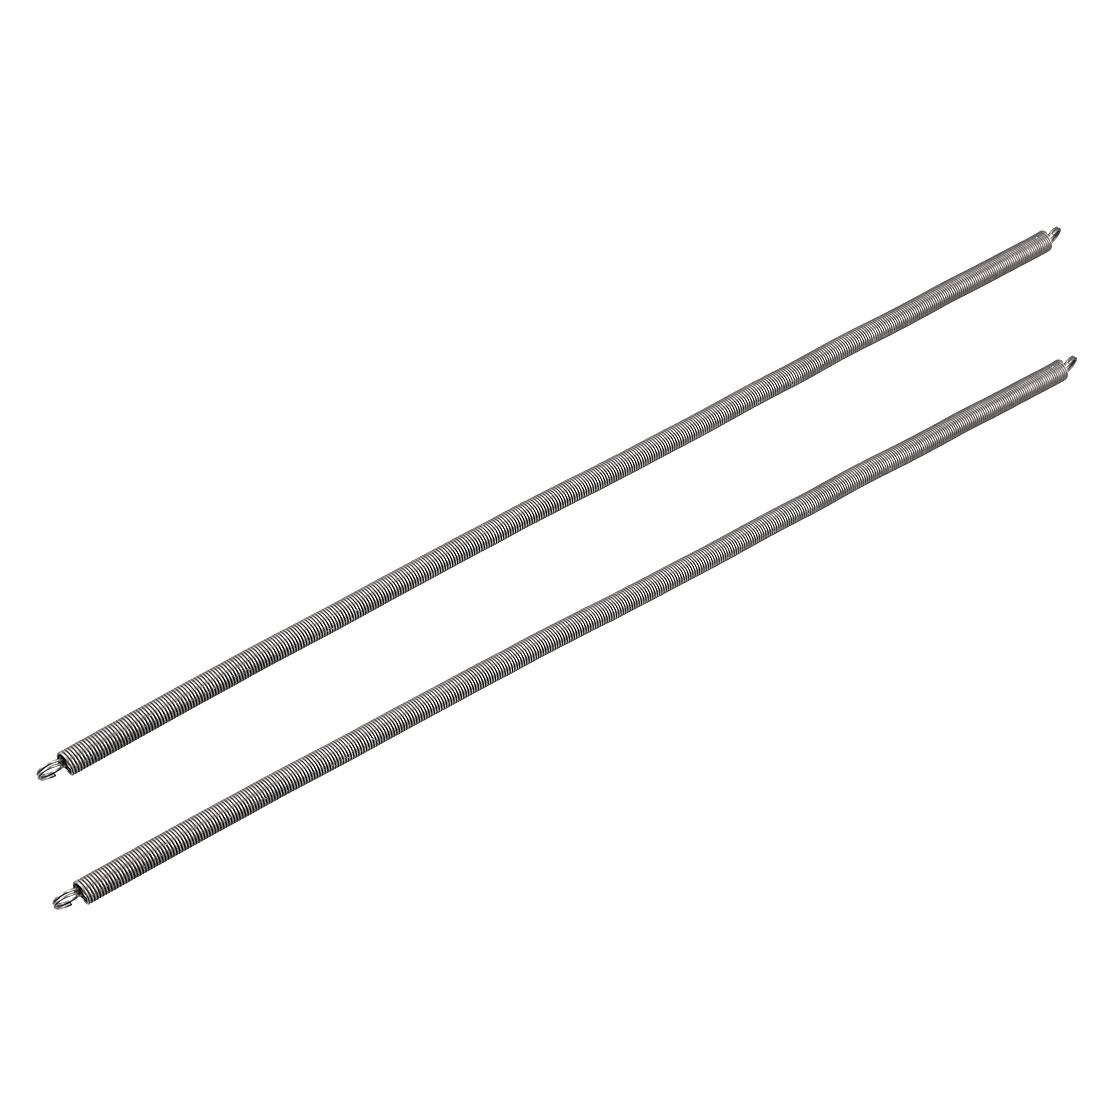 0.7mmx7mmx300mm Spring Steel Extension Tension Springs Black 2pcs